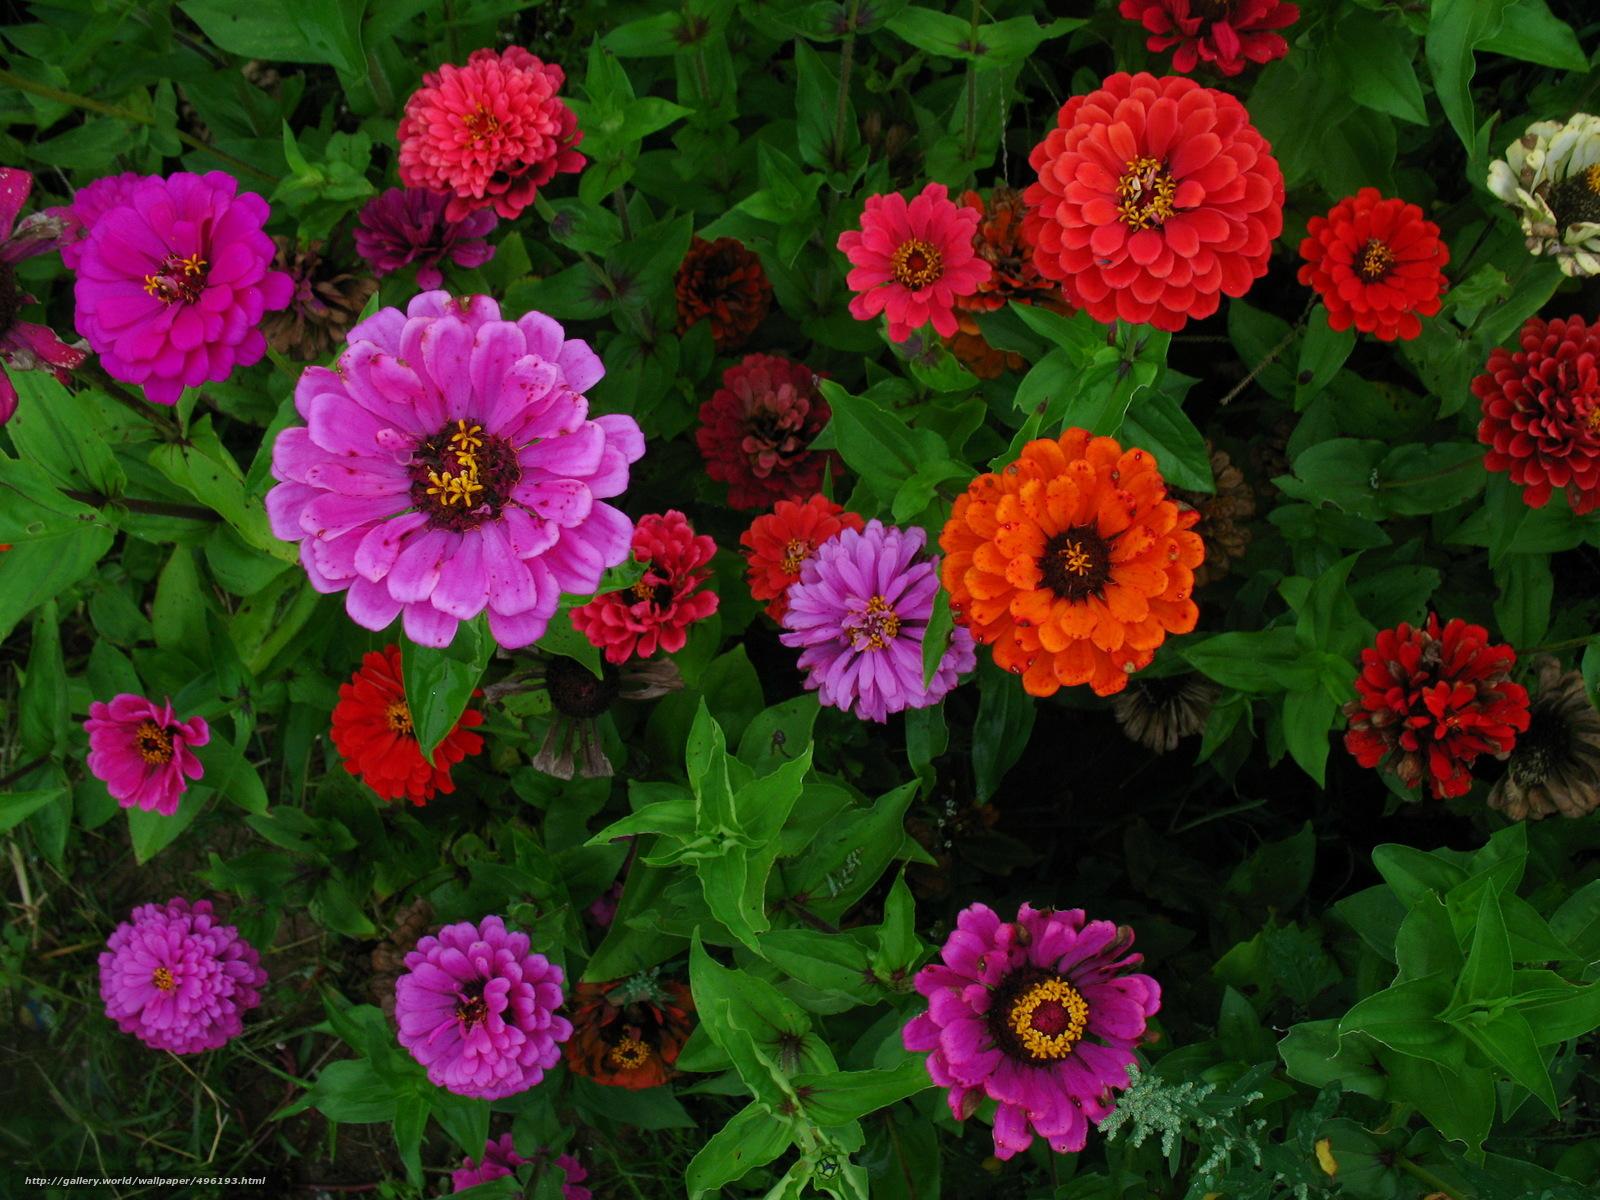 Циния цветов